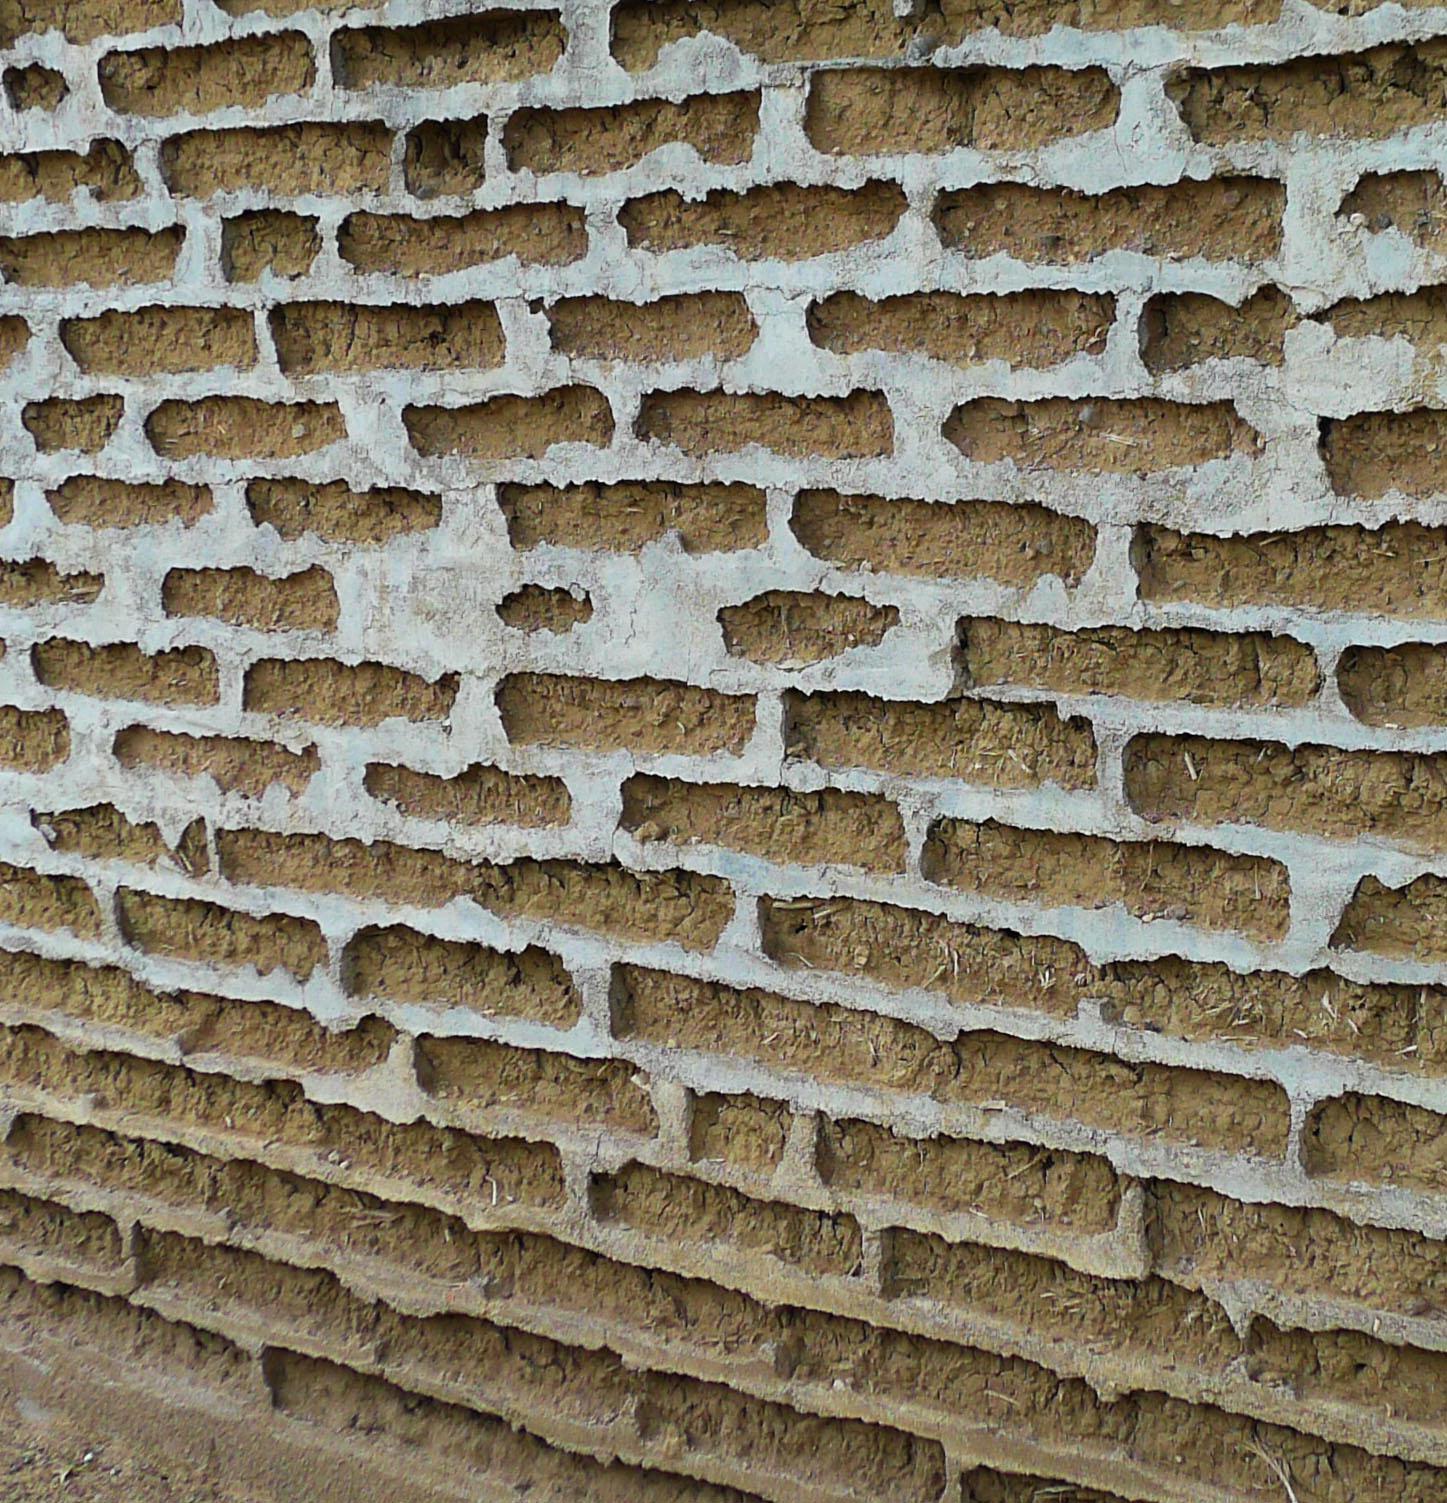 Wall Texture 5.jpg